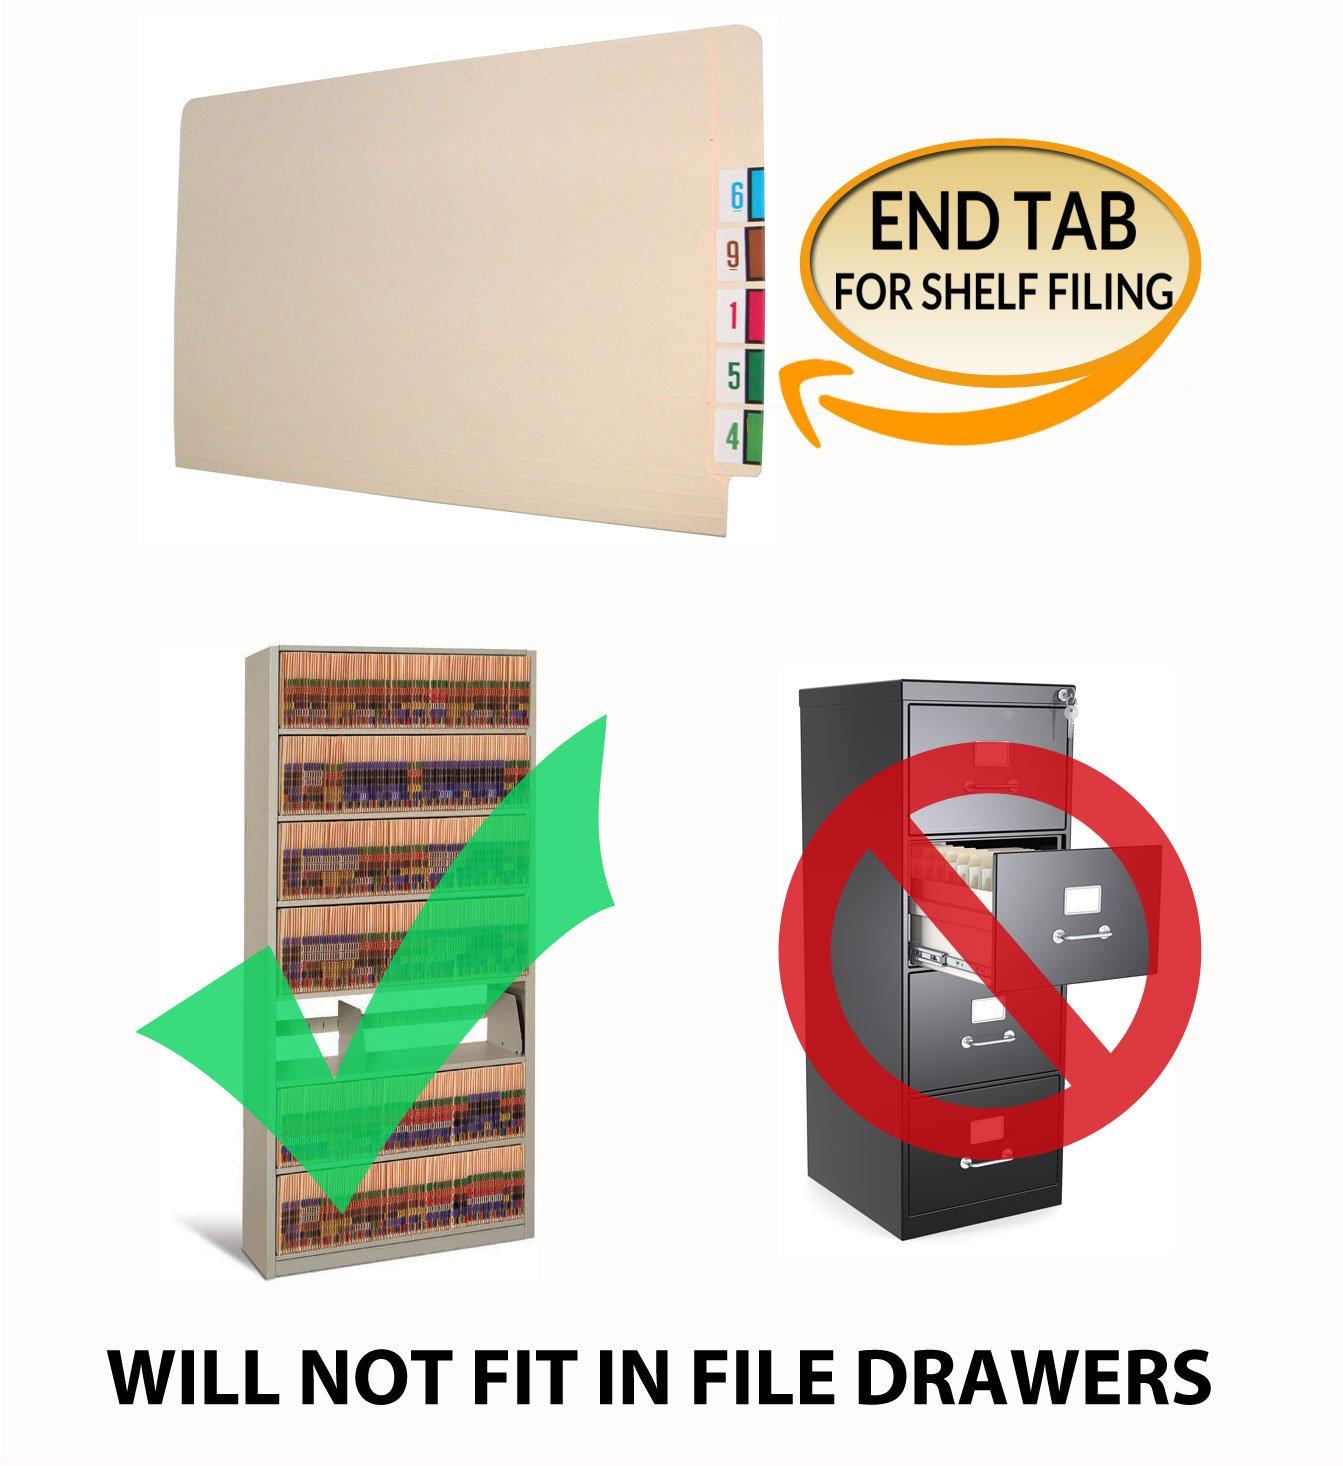 Full Diagonal Pocket Letter Size Full Cut End Tab 11 pt Manila Folders Fasteners Pos #1 /& #3 Box of 50